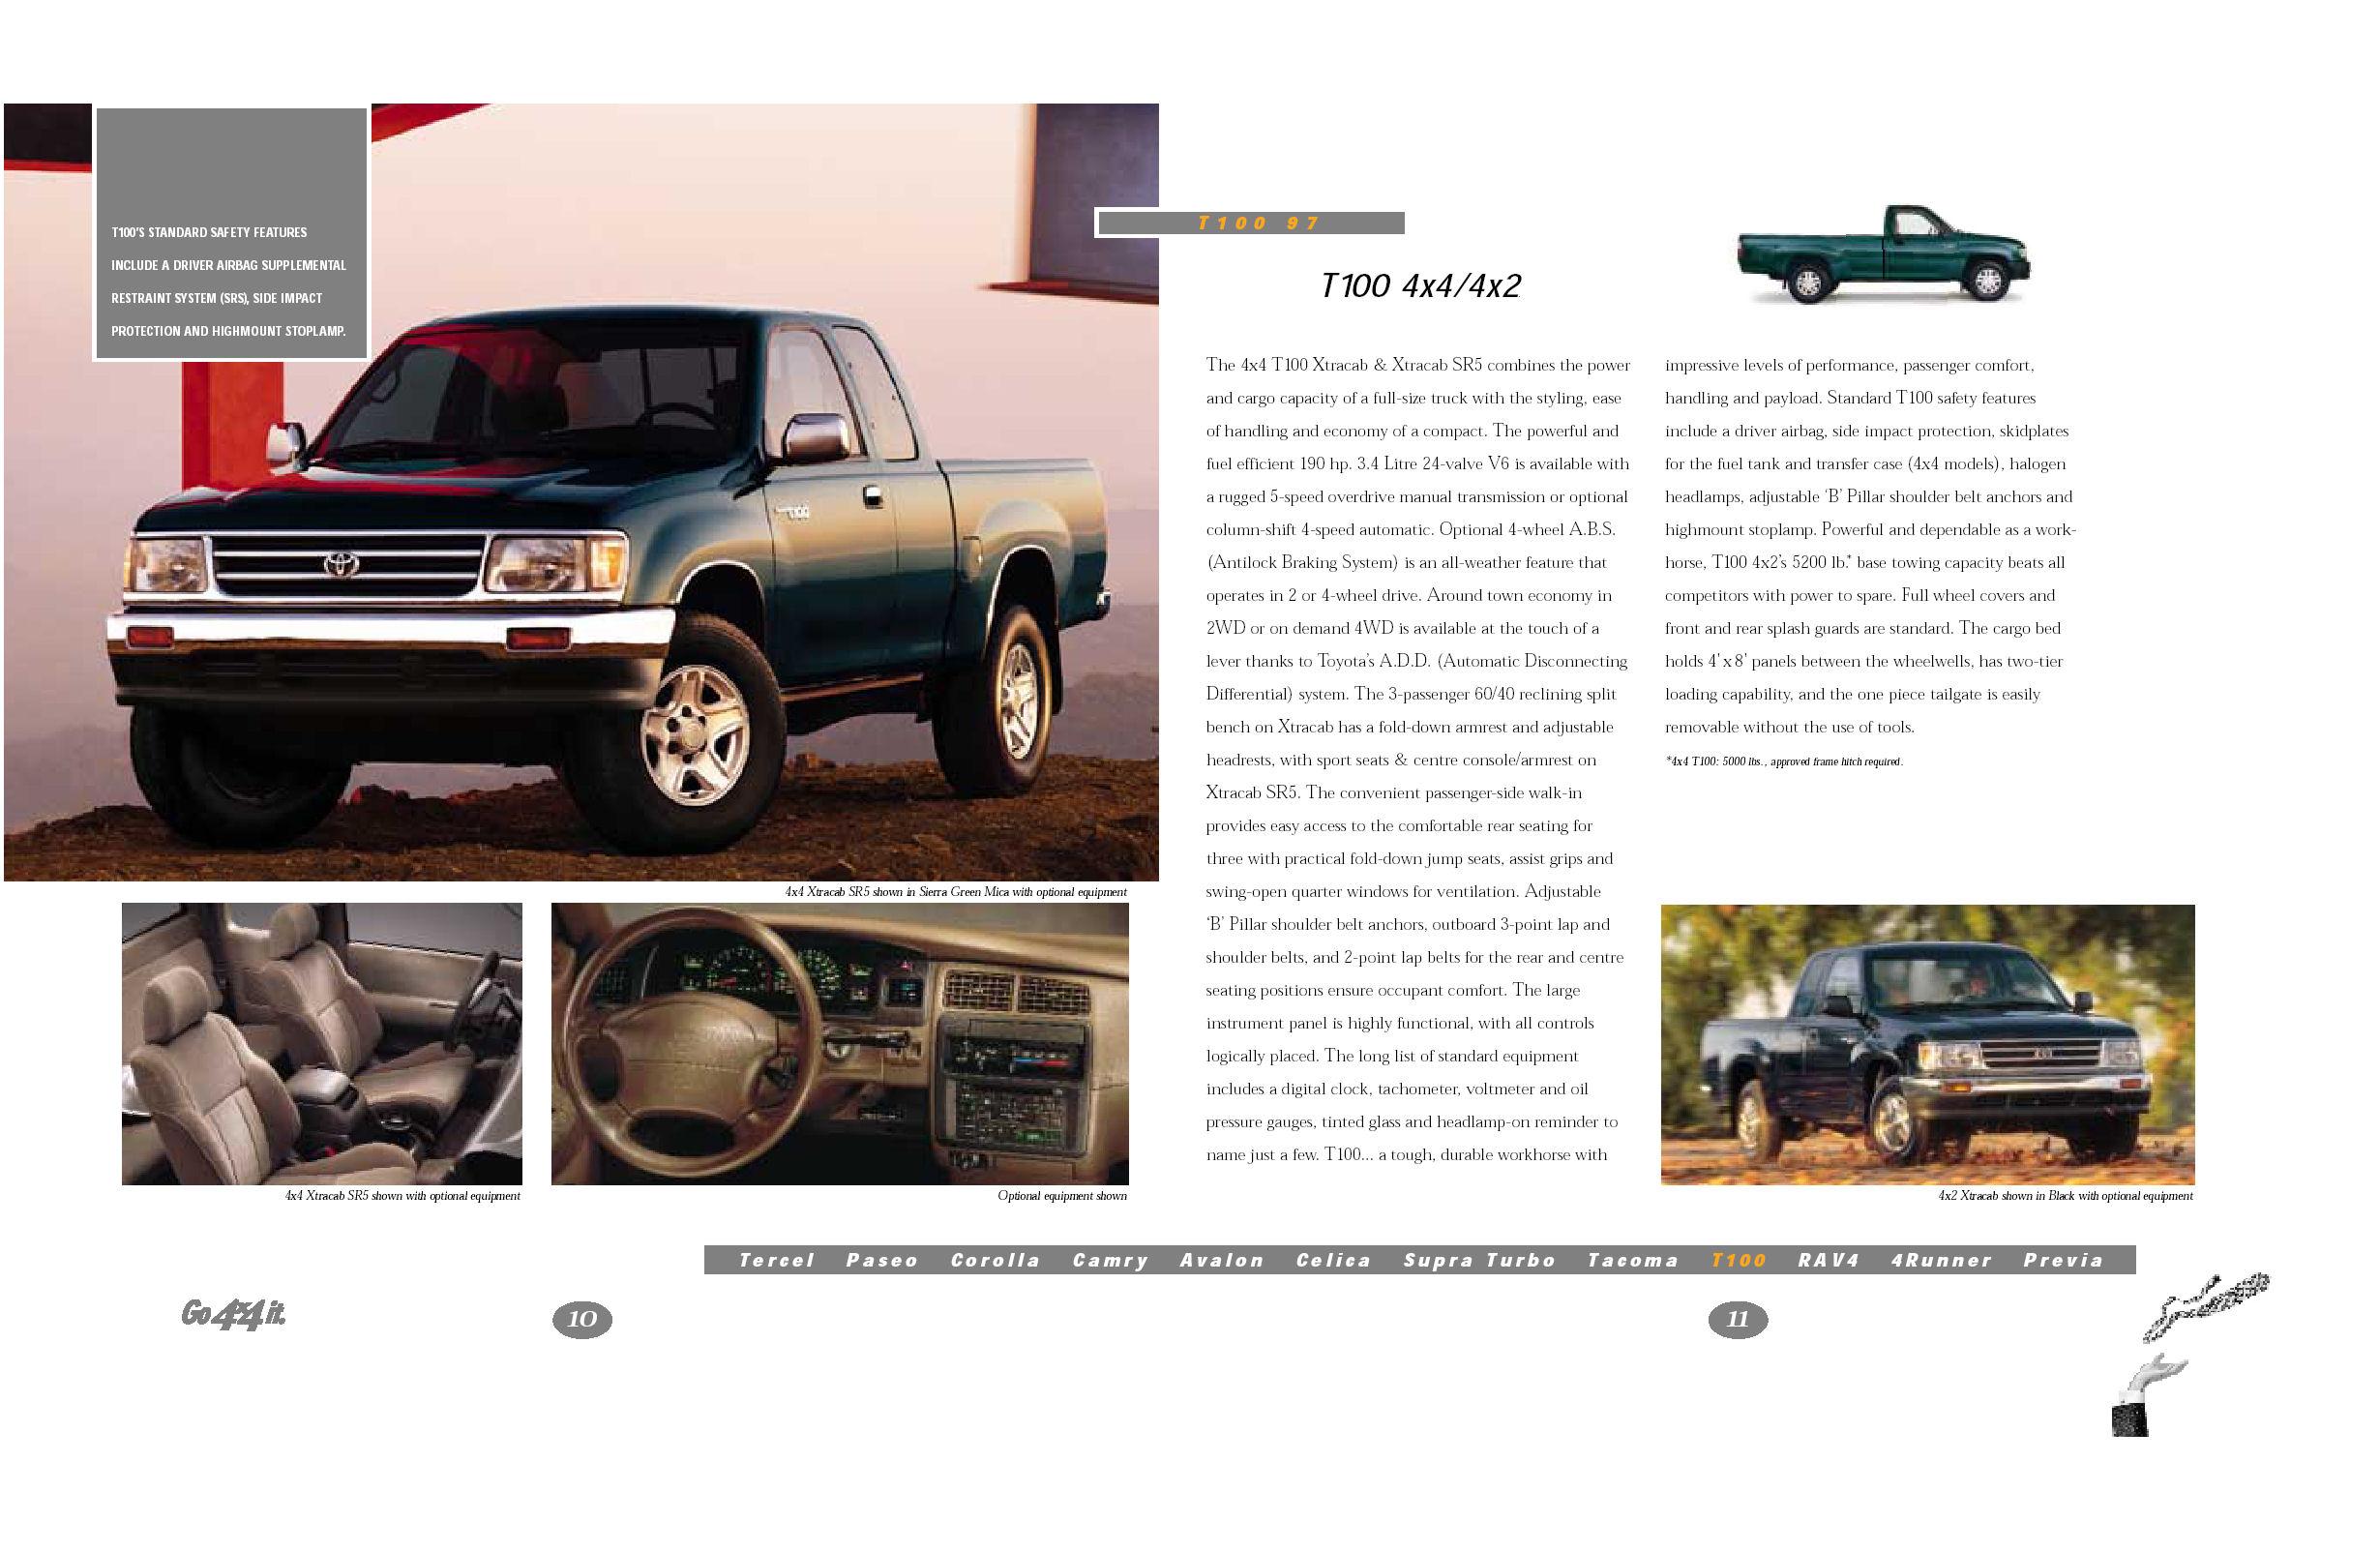 1997 Toyota Tacoma Brochure